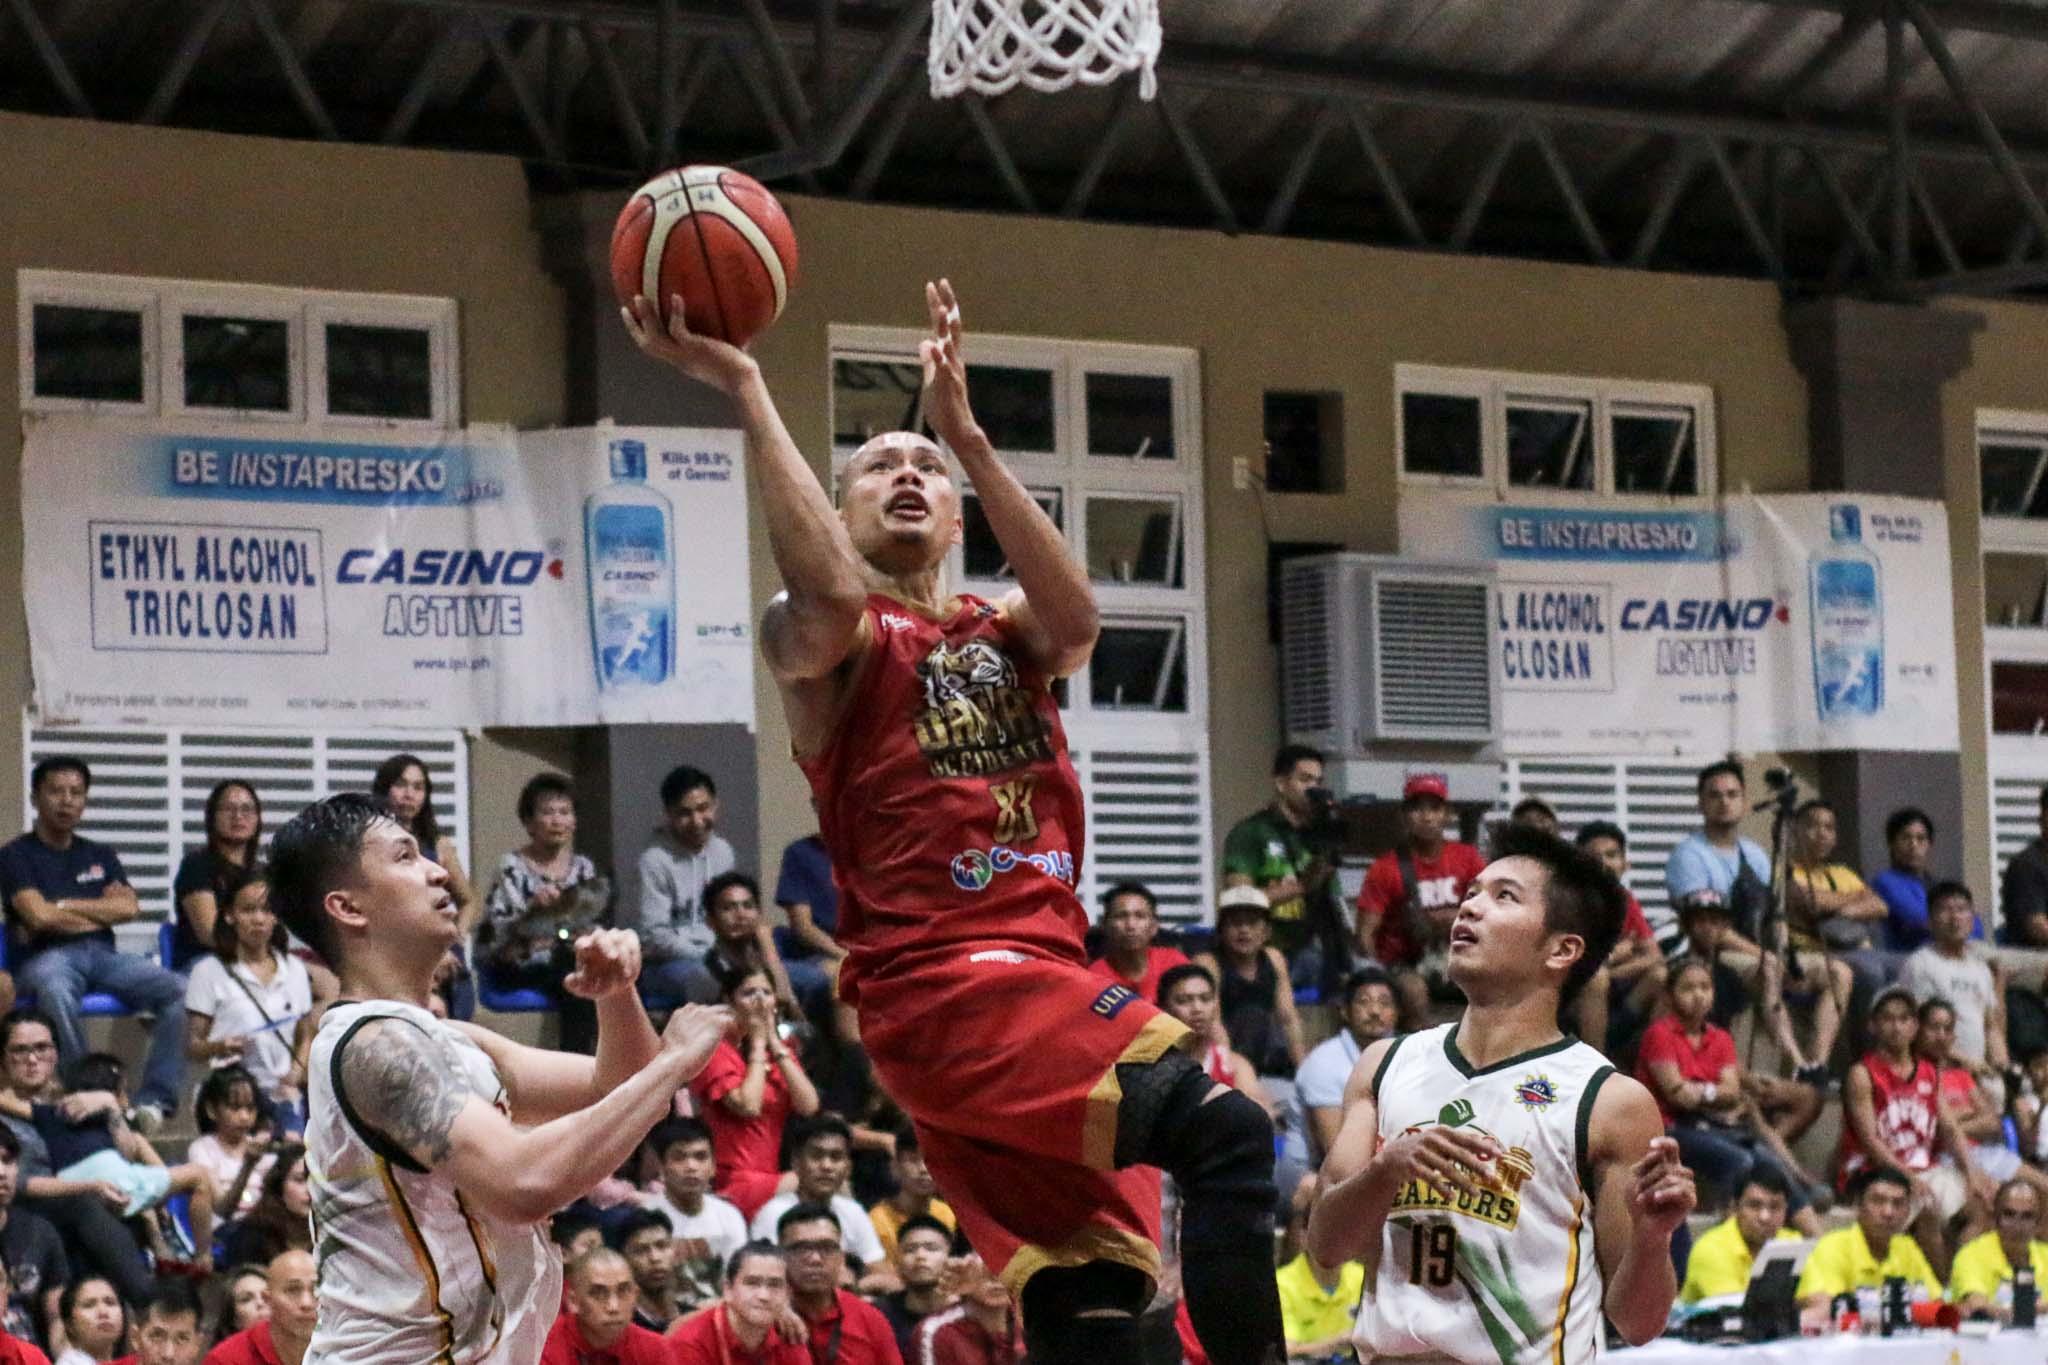 Tiebreaker Times Mark Yee takes charge as Davao Occidental ekes out win over Pasig in MPBL Basketball MPBL News  Yvan Ludovice Robbie Manalang Pasig-Sta. Lucia Realtors Mark Yee Josan Nimes Fonzo Gotladera Don Dulay 2019-20 mpbl season